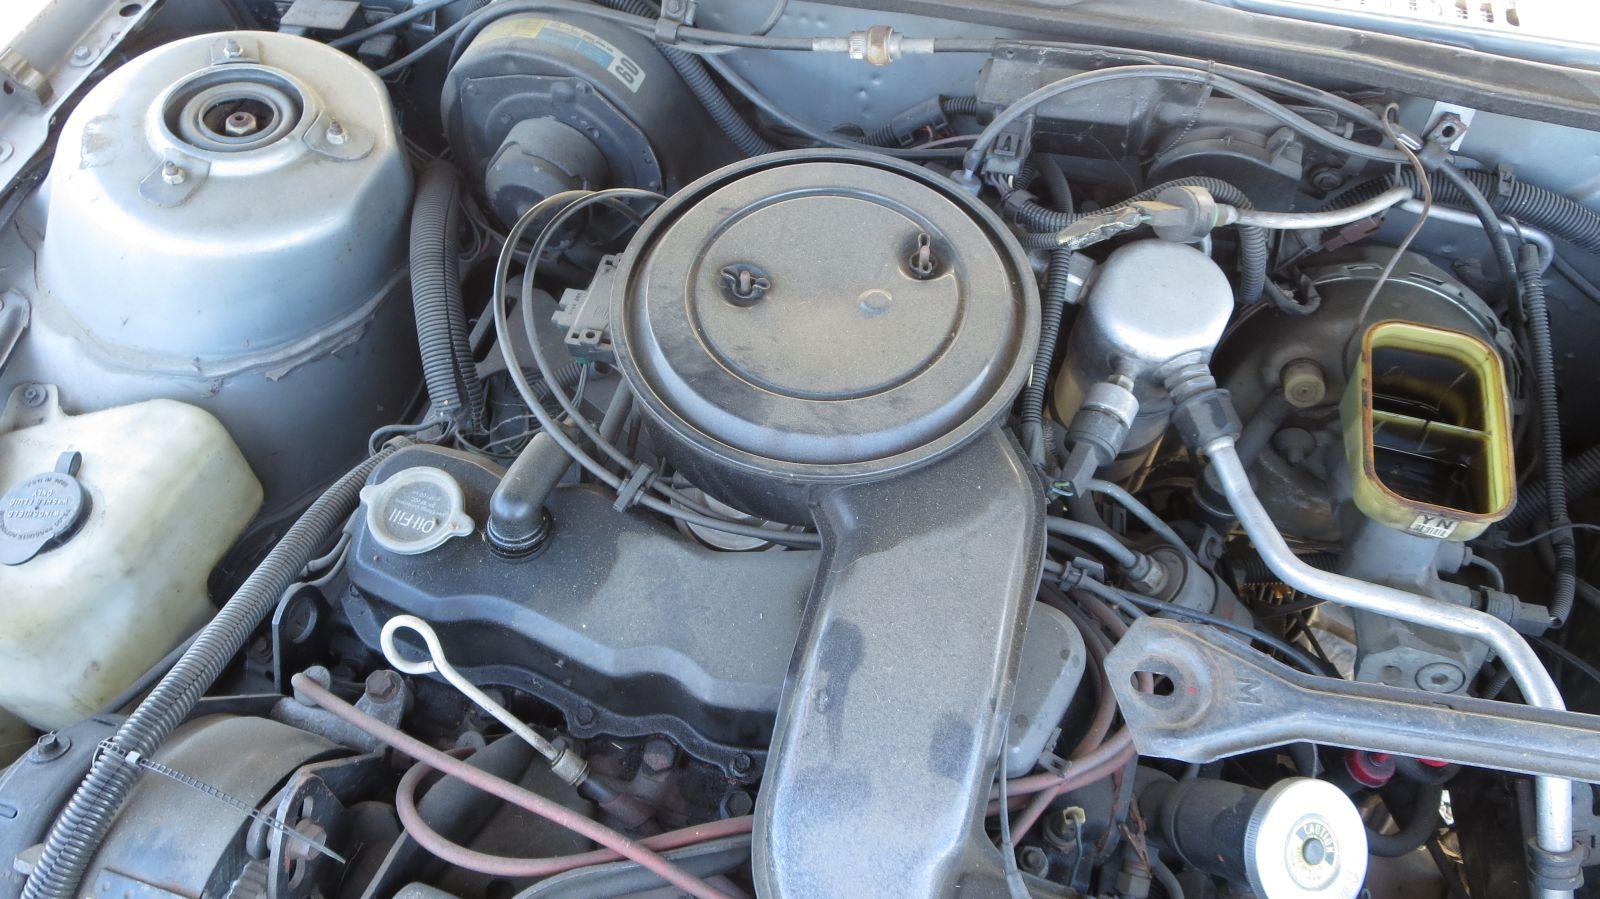 GM Iron Duke engine in 1984 Oldsmobile Omega